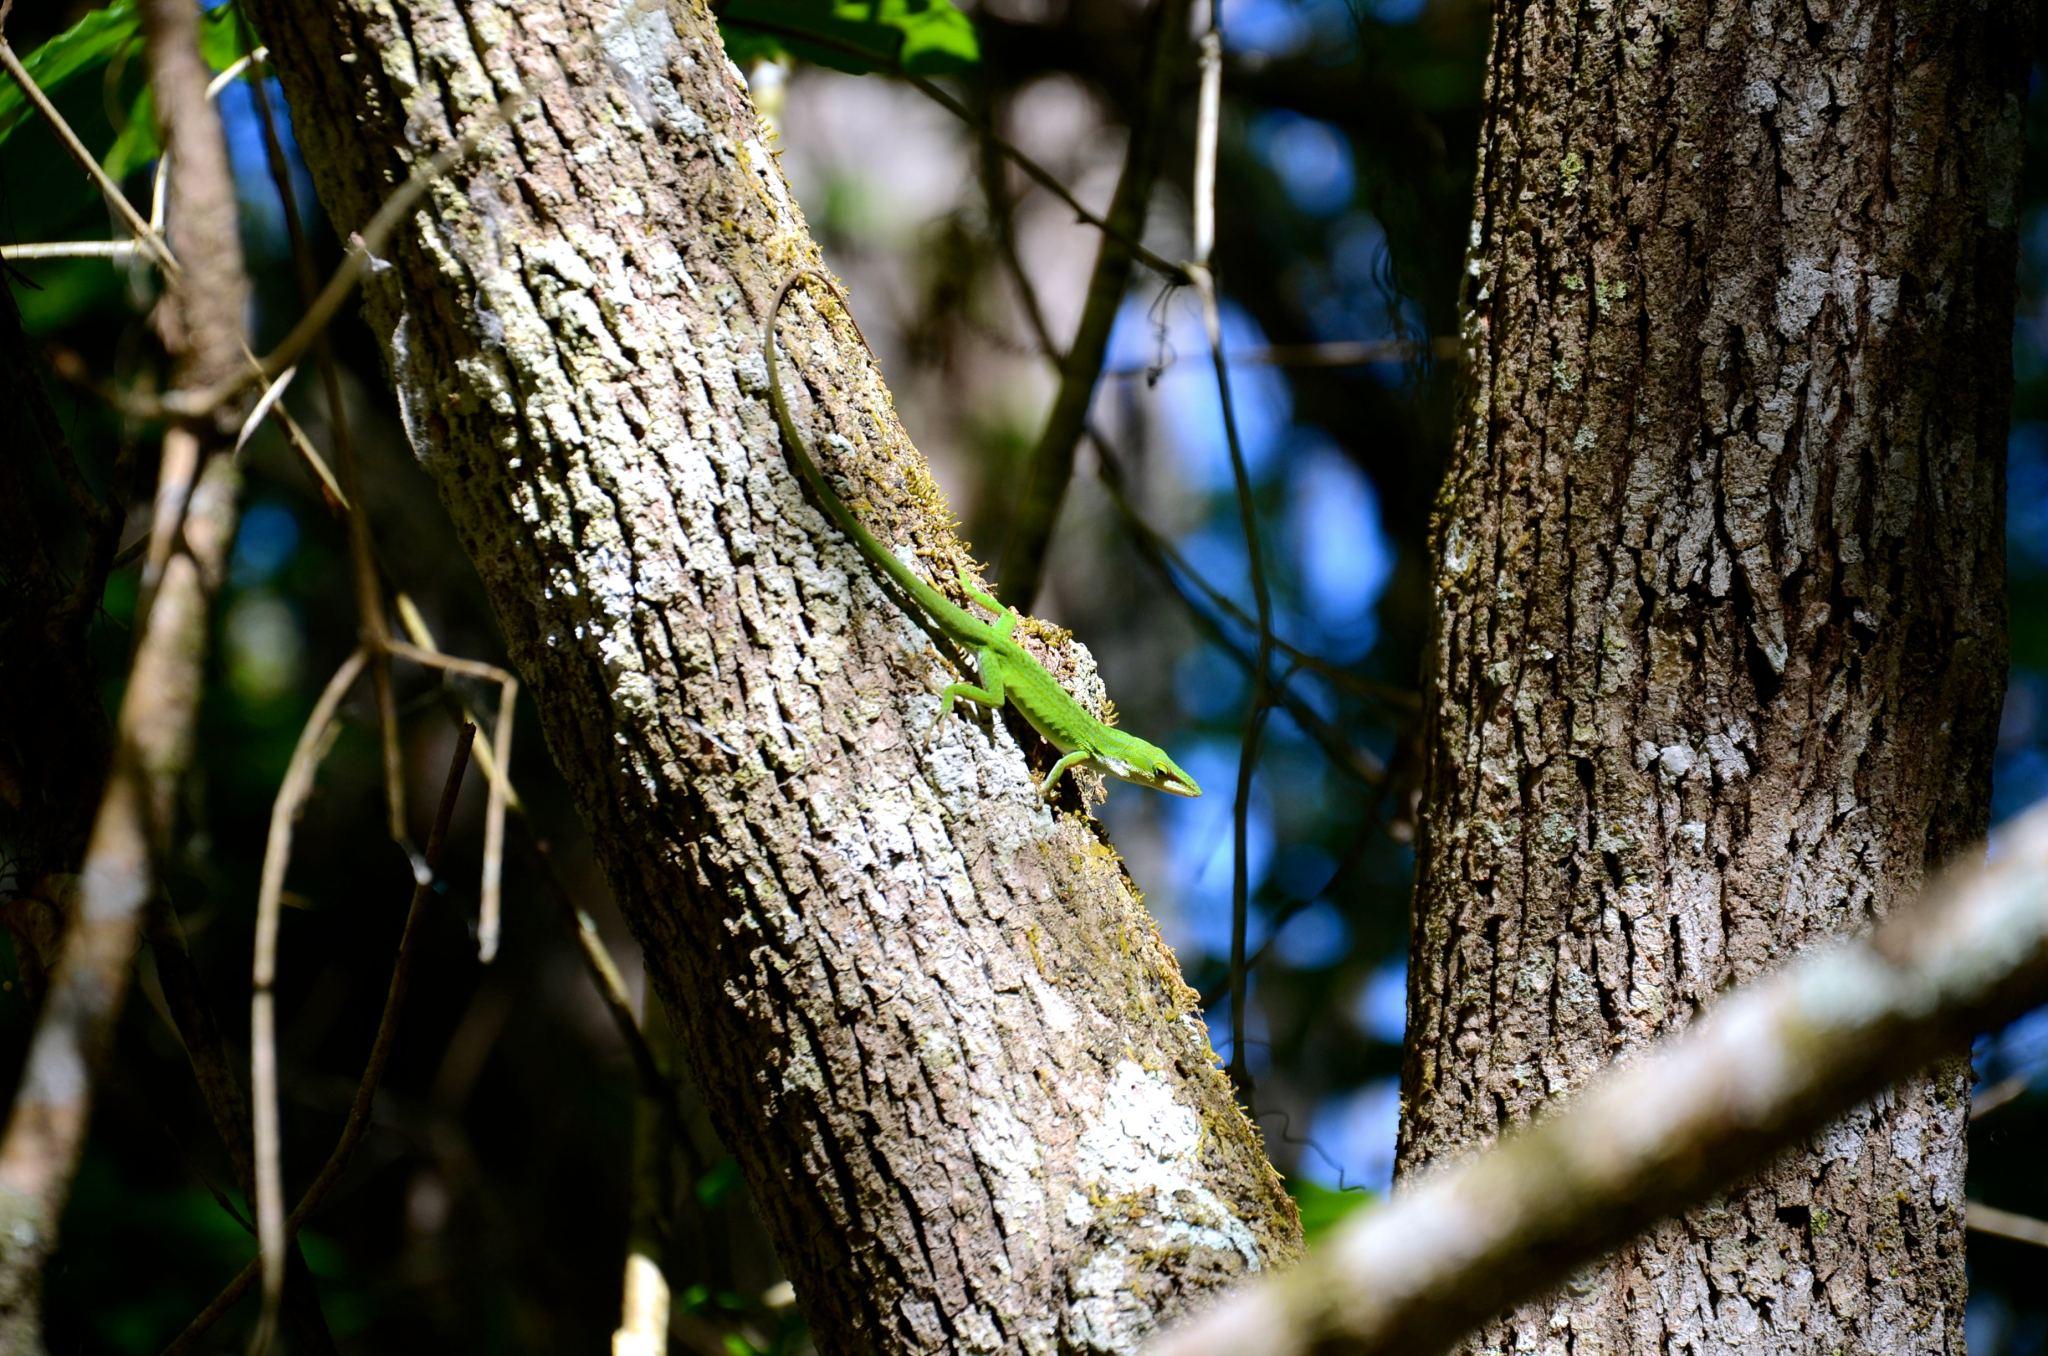 Lizard at Corkscrew Swamp Sanctuary in Naples Florida.